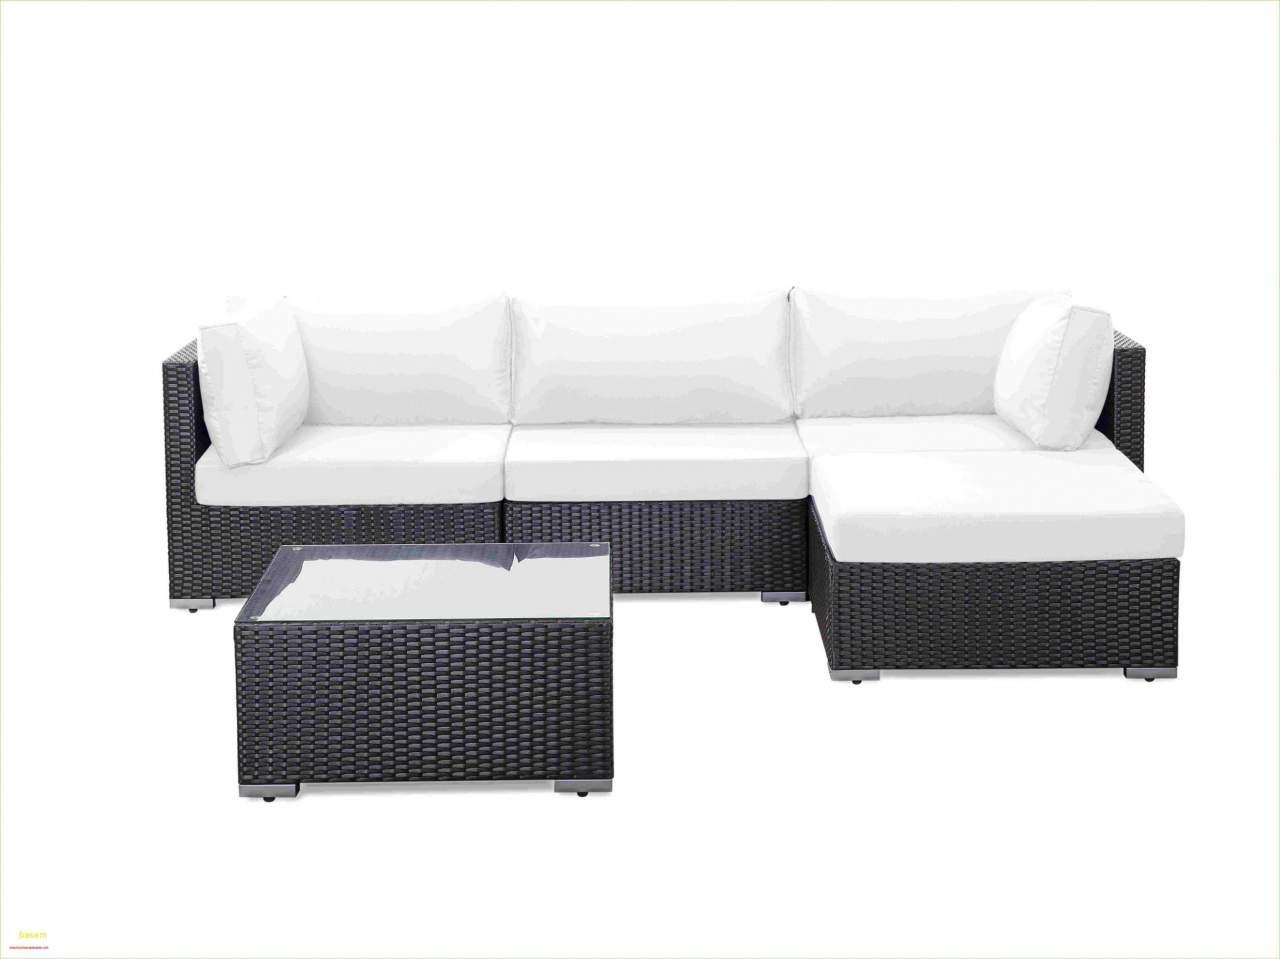 ecksofa garten das beste von cheap patio chairs garten sale neu lounge outdoor of ecksofa garten